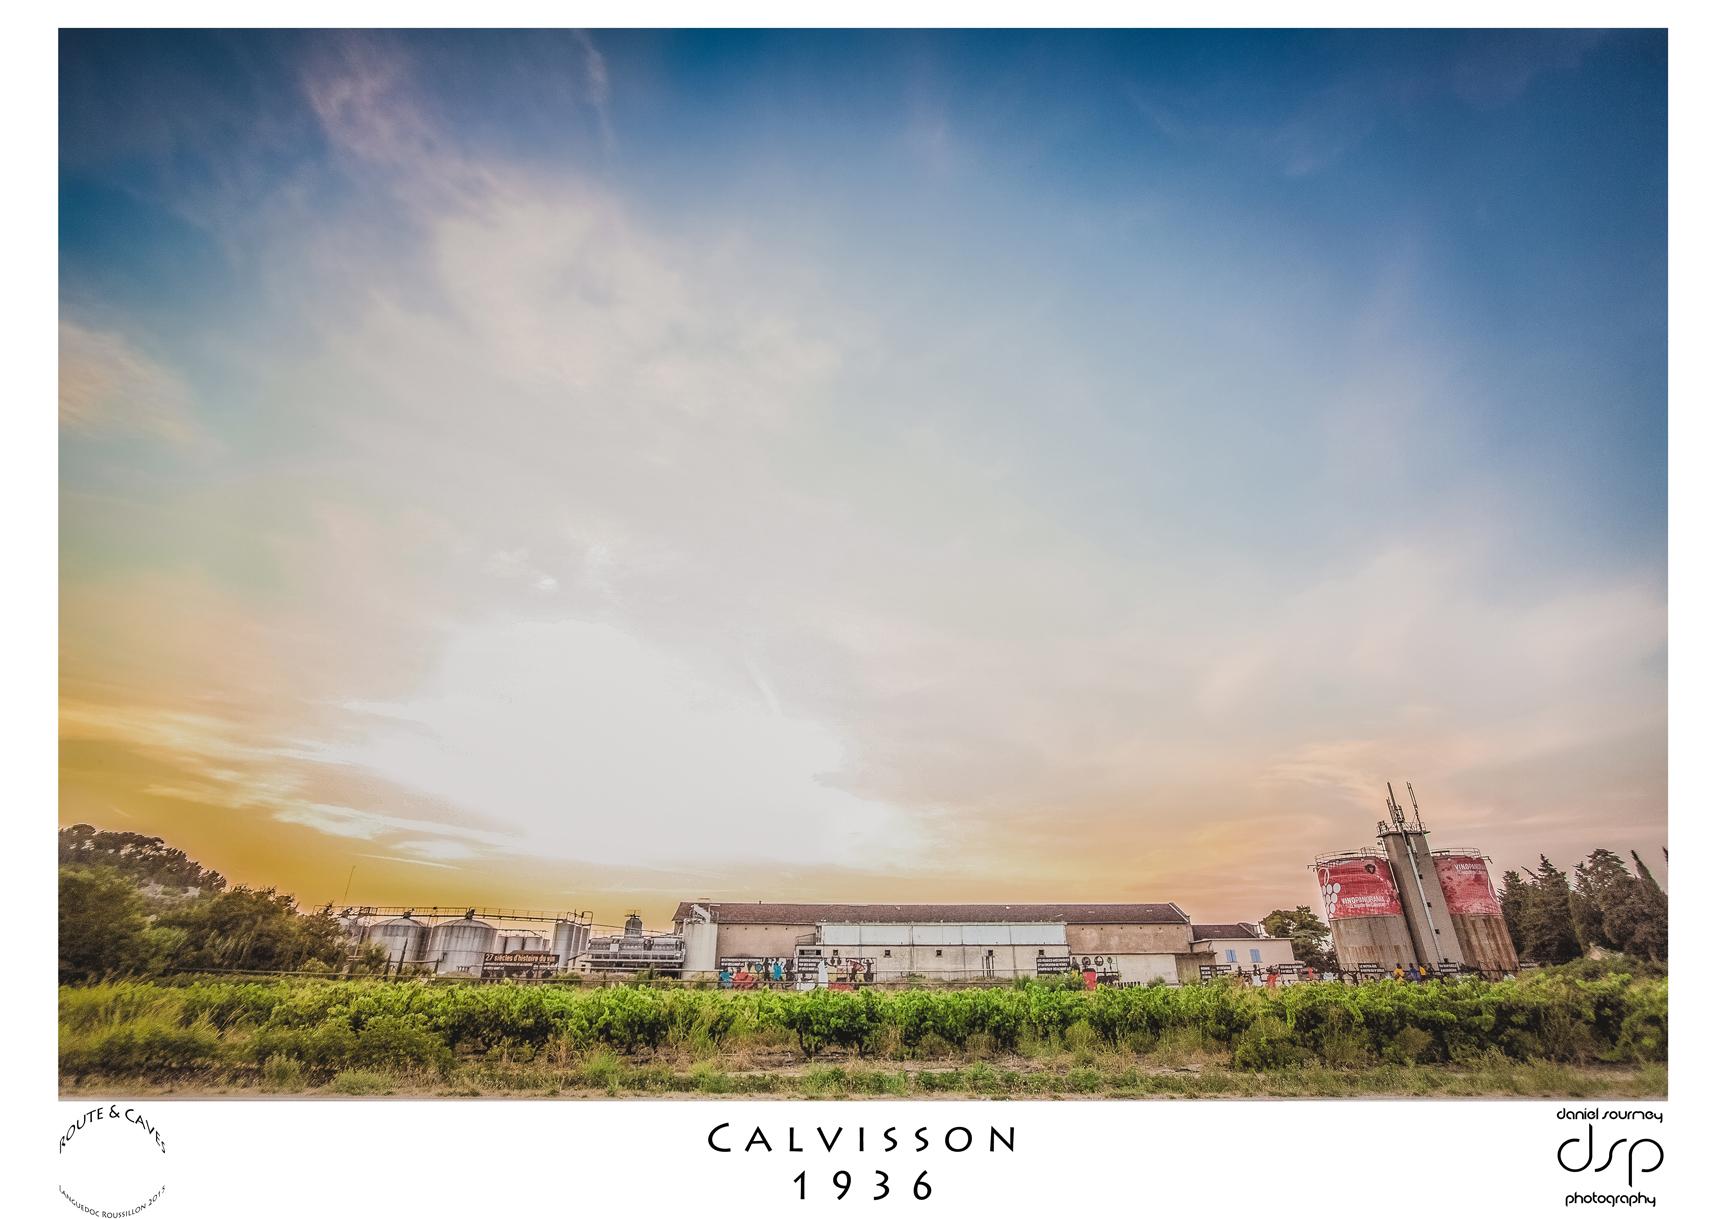 Cave coopérative de Calvisson